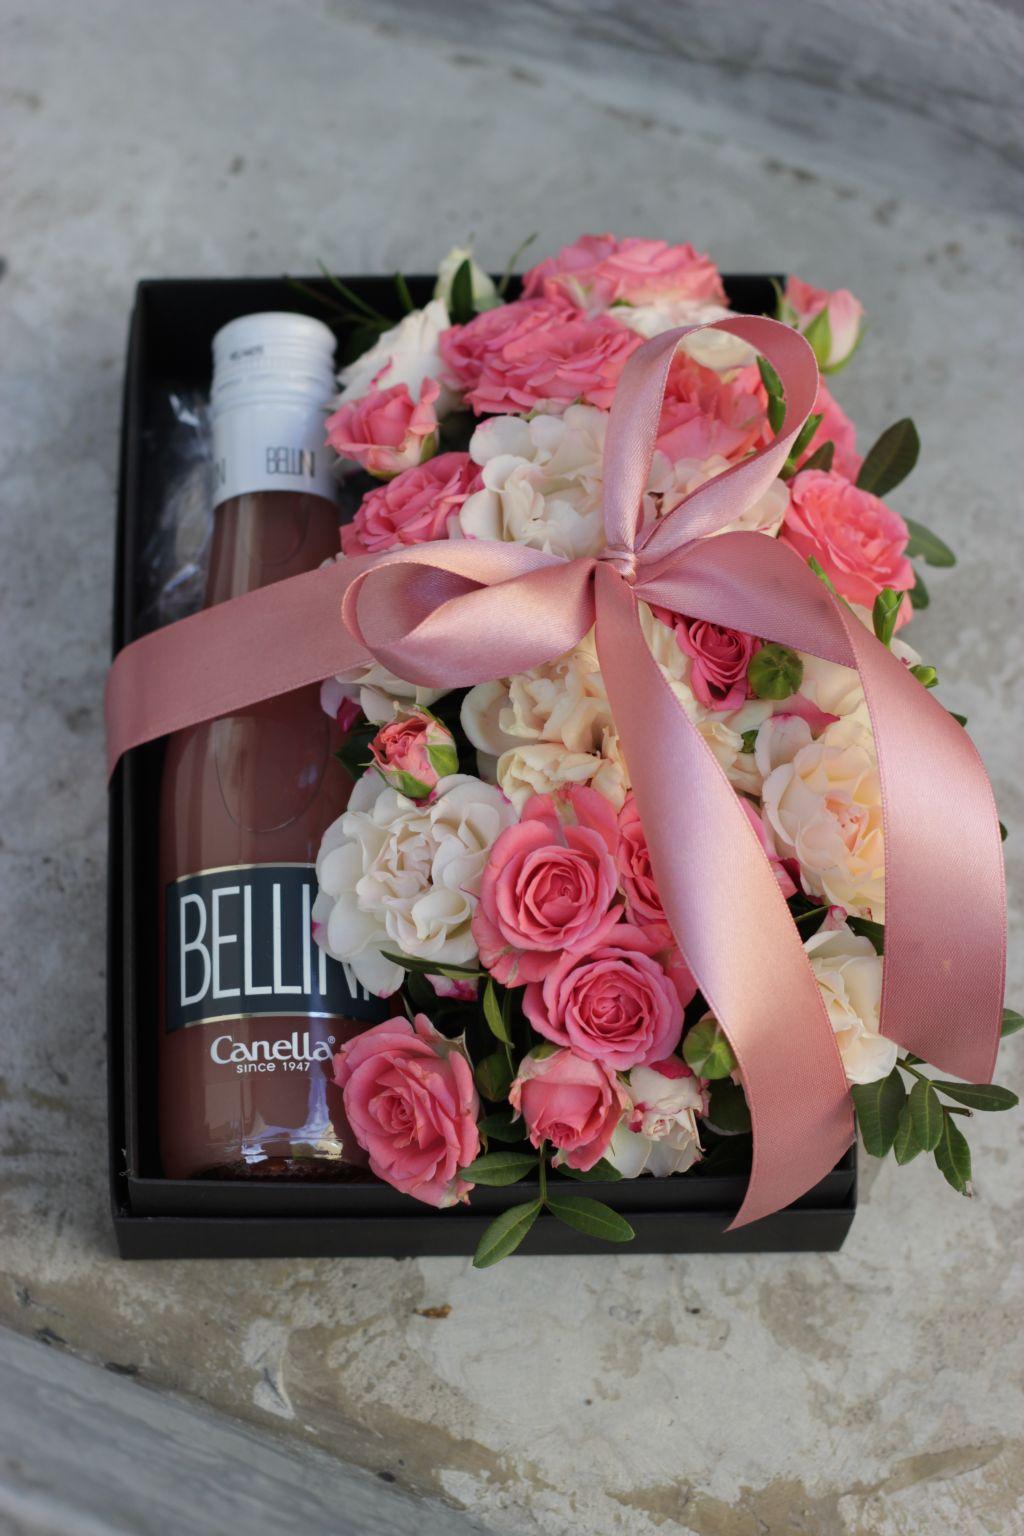 Lillekarp, suvine Bellini, lilled Belliniga, väike bellini